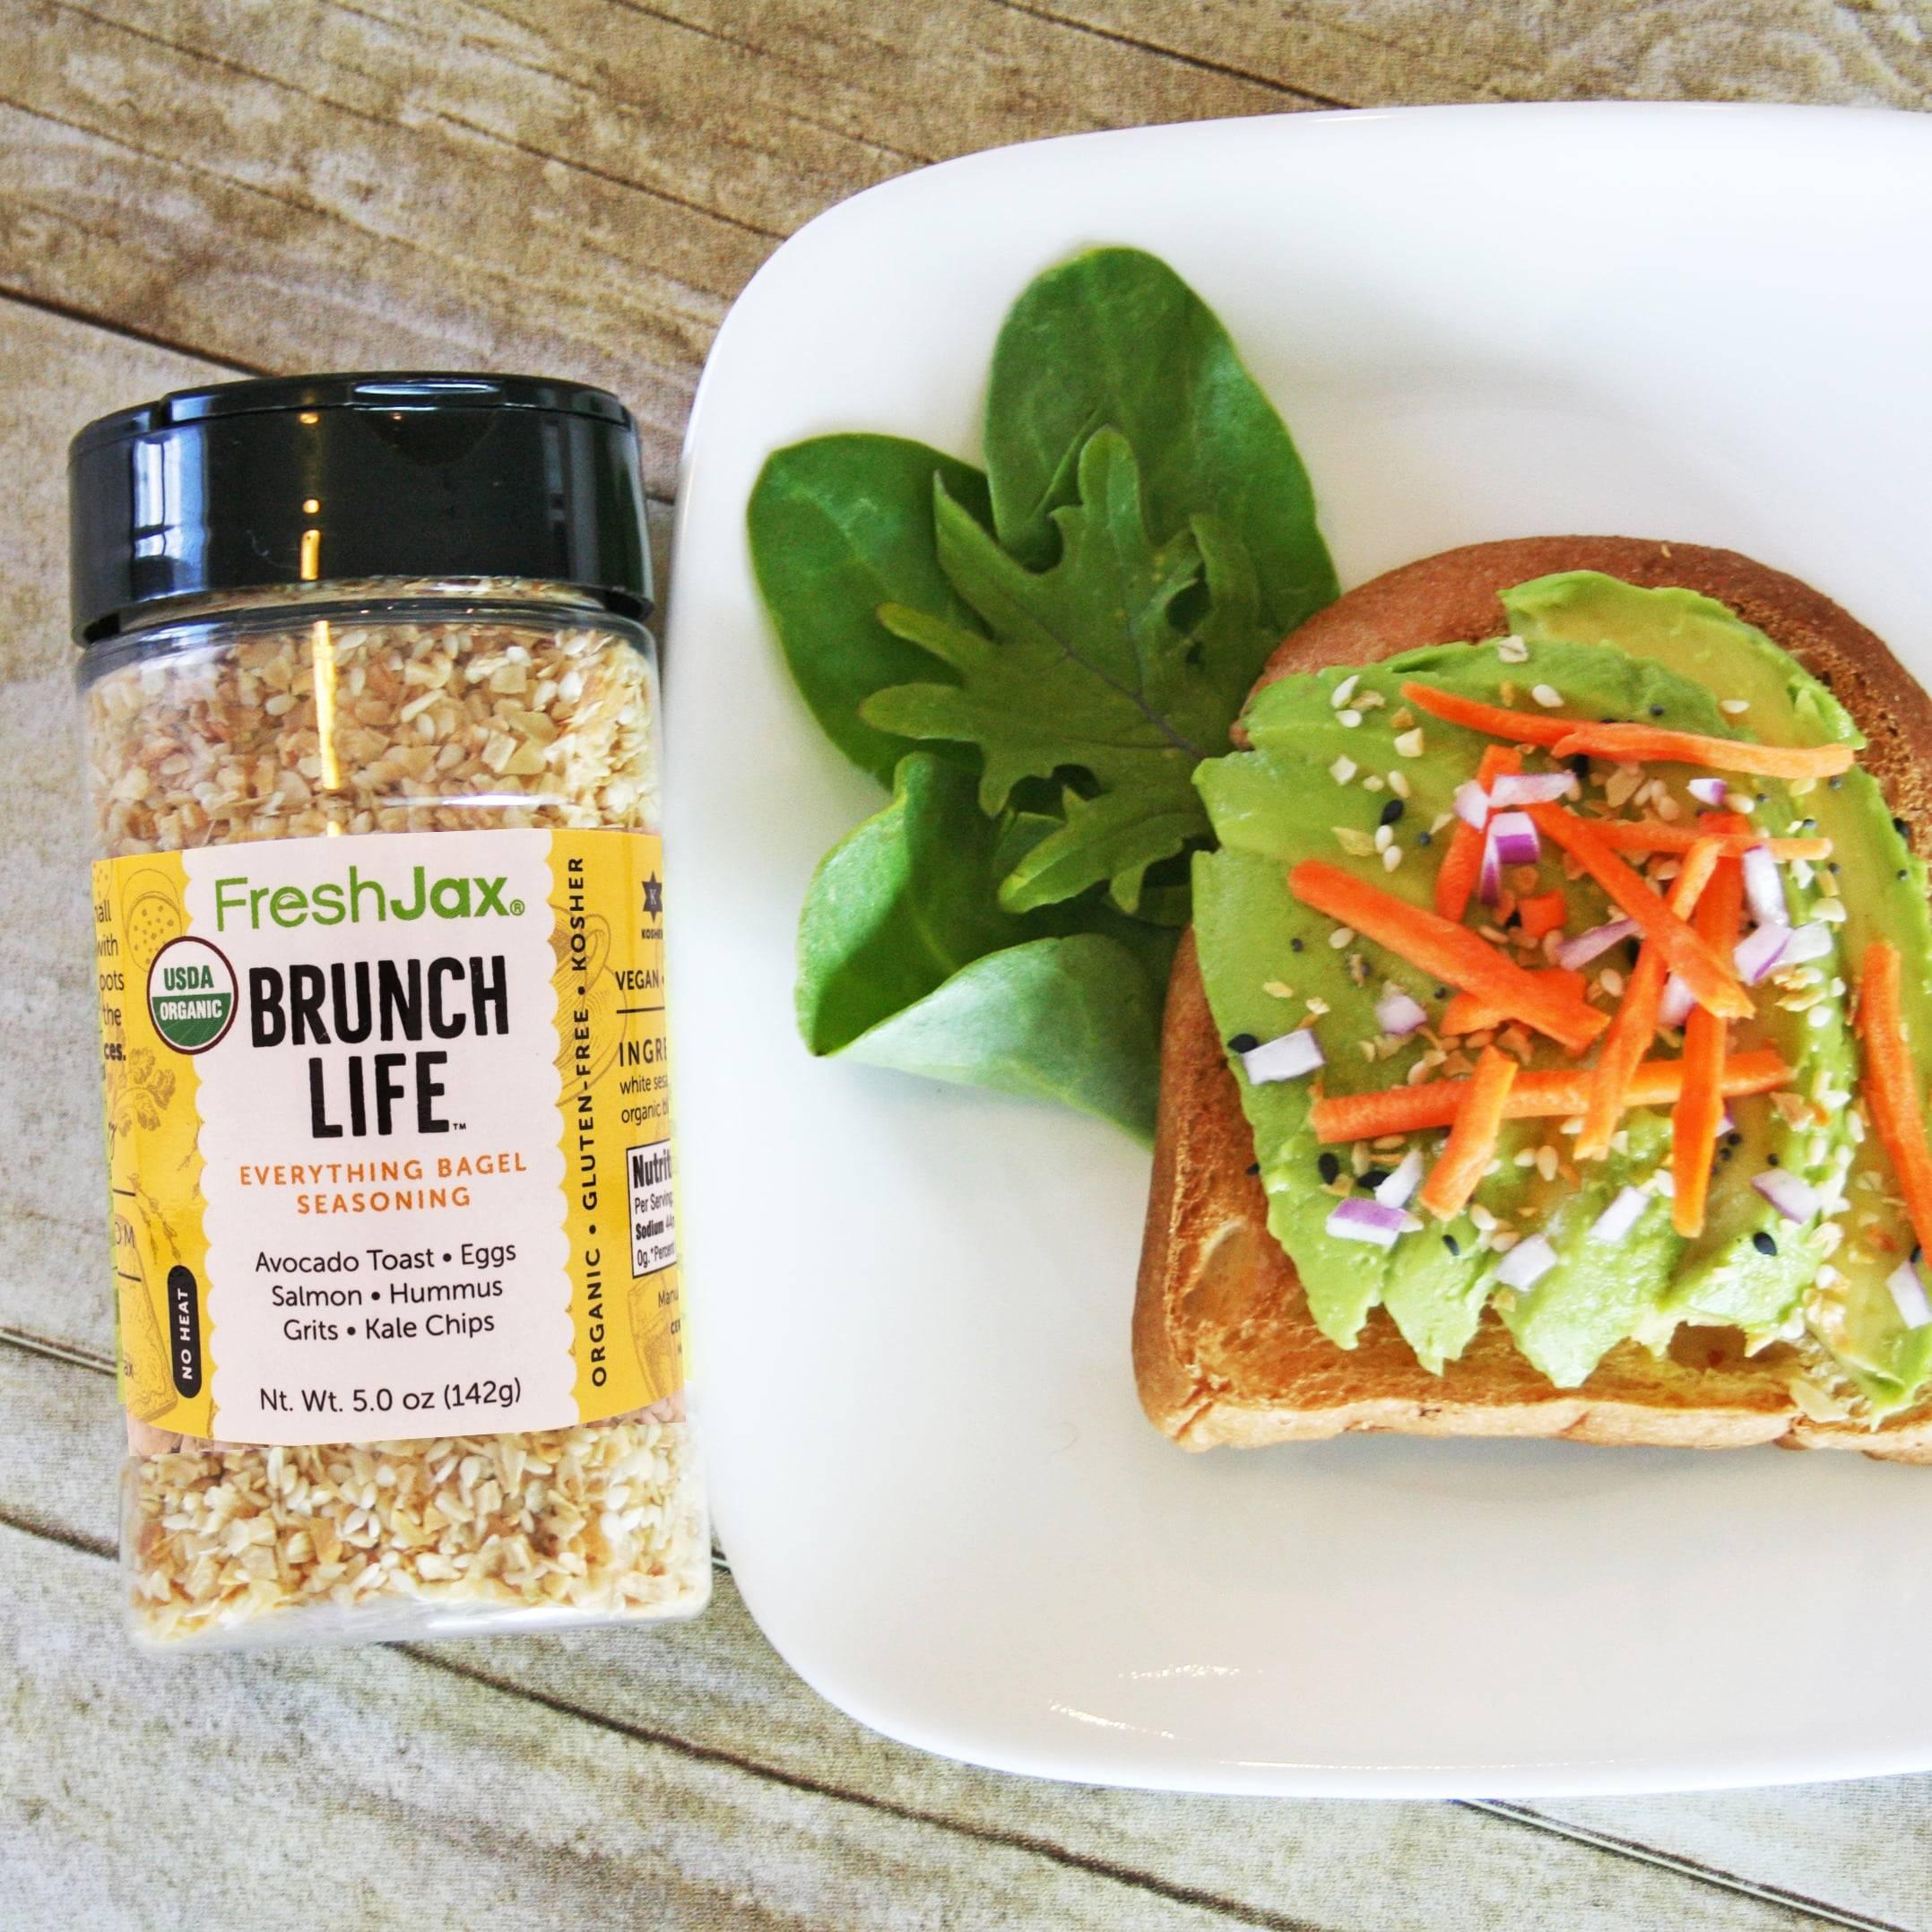 Brunch Life Organic Everything Bagel Seasoning With Avocado Toast